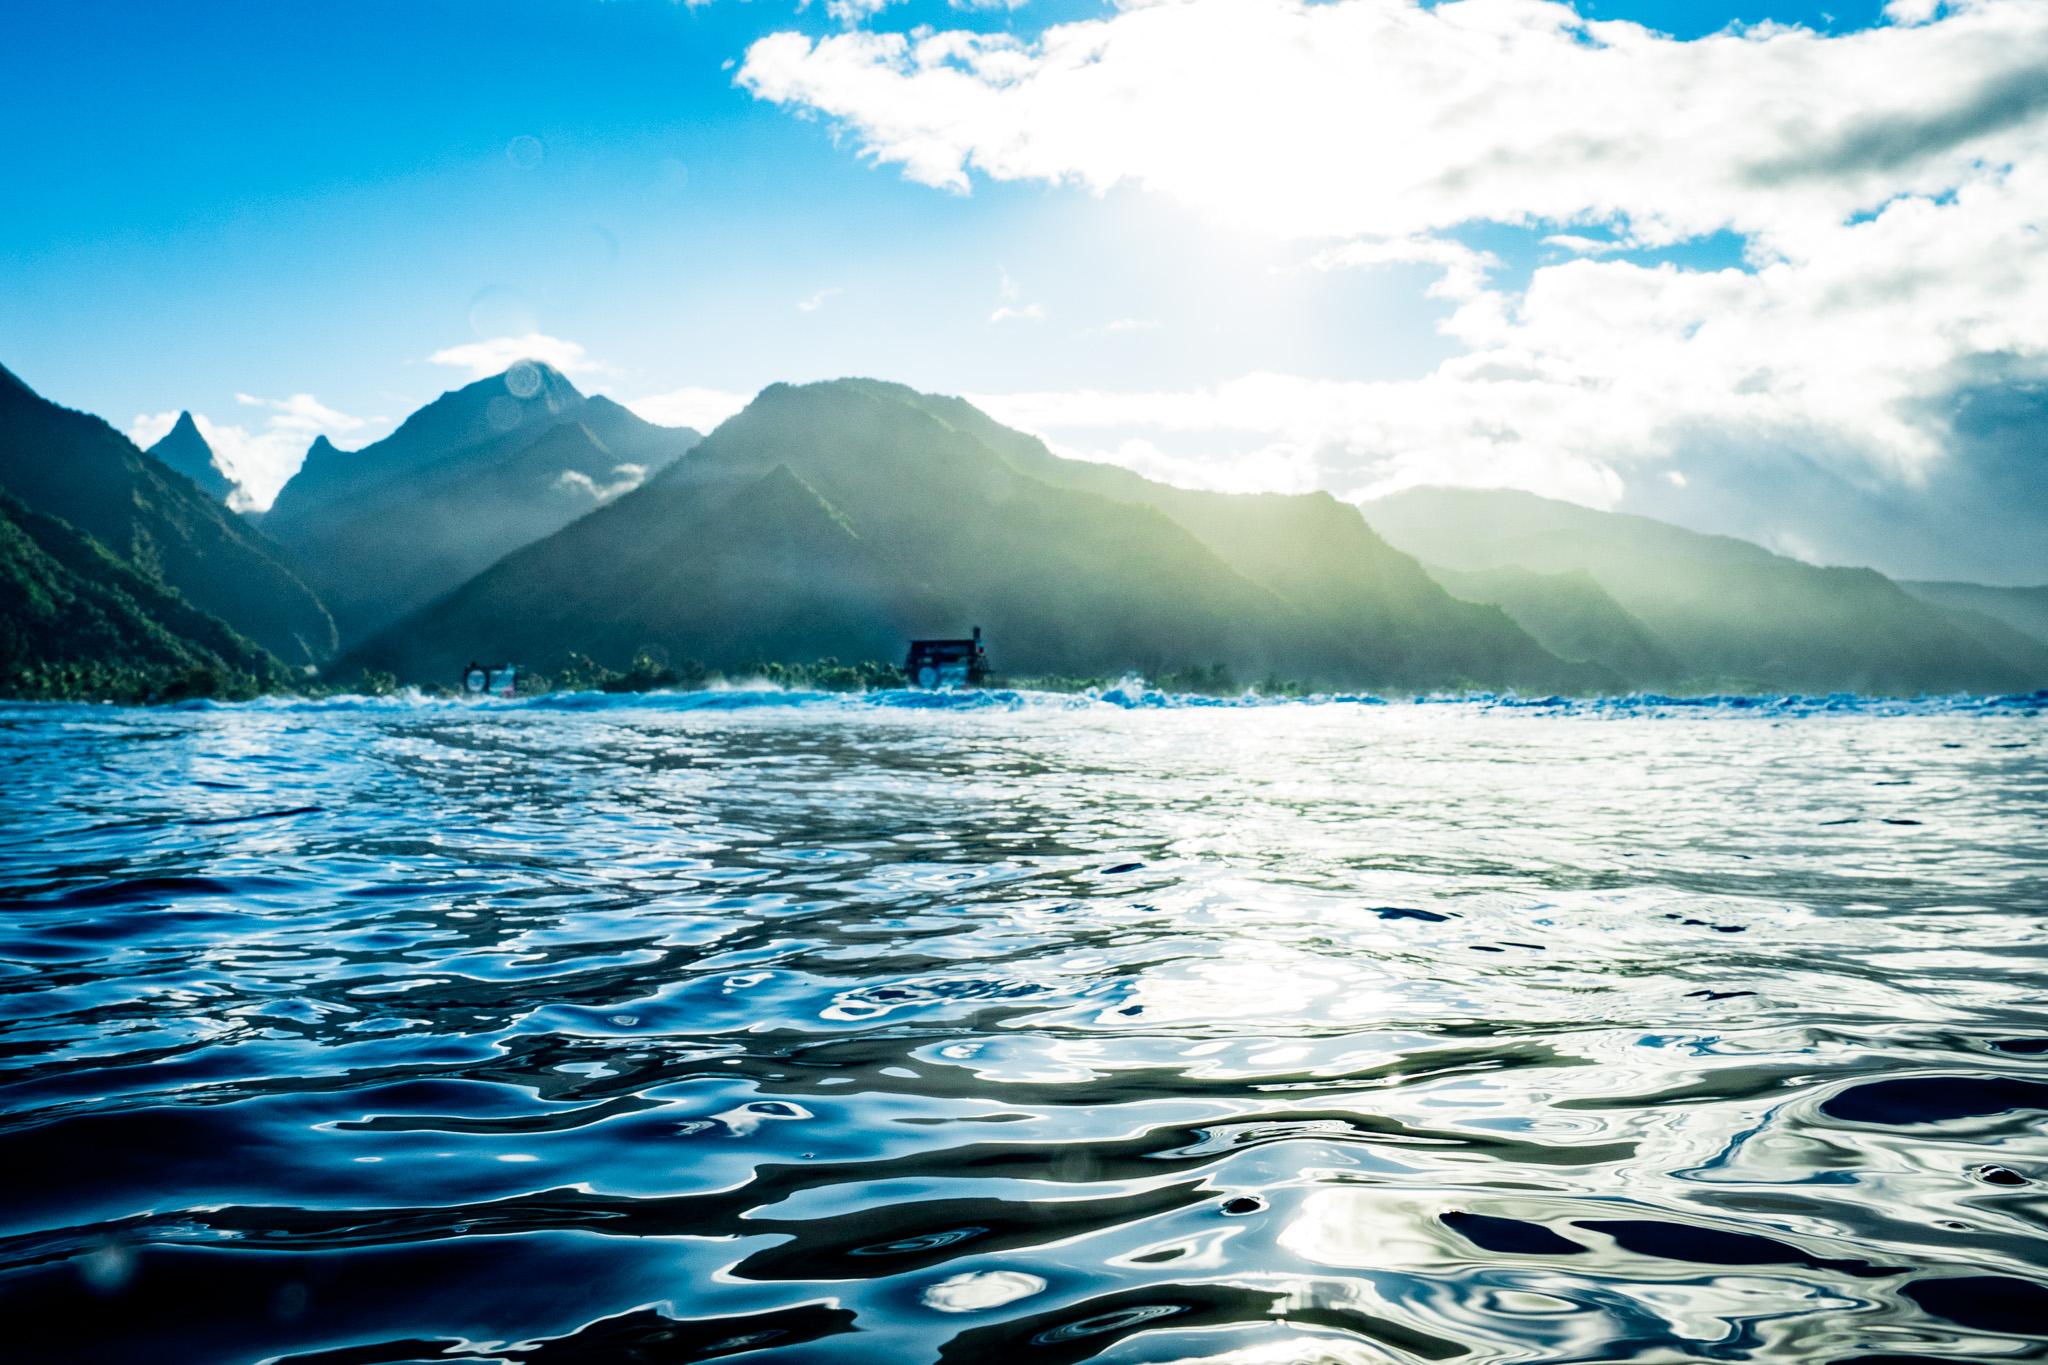 Billabong Pro 2015 WSL, Teahupoo, Tahiti, French Polynesia